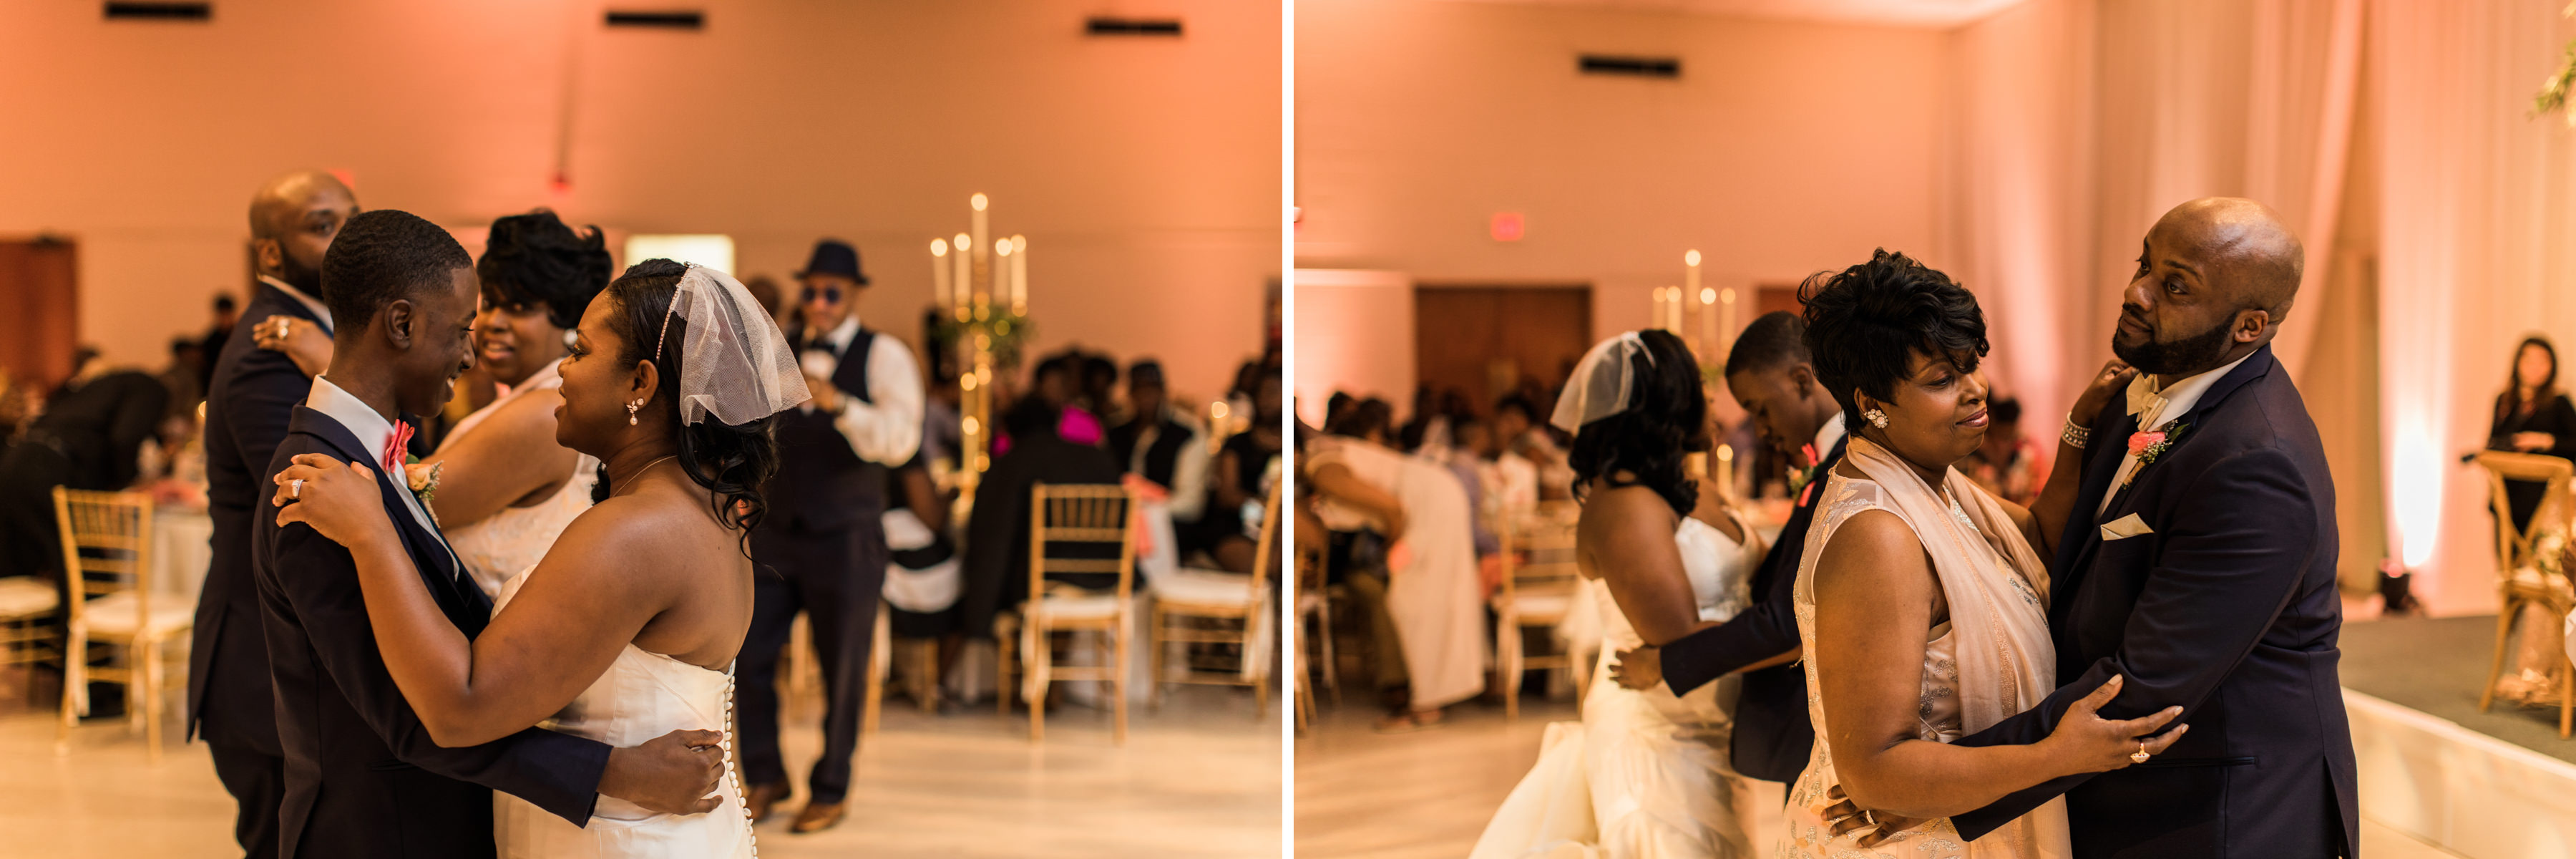 FLOWERS_WEDDING_SELMA_ALABAMA_WEDDING_PHOTOGRAPHY_143